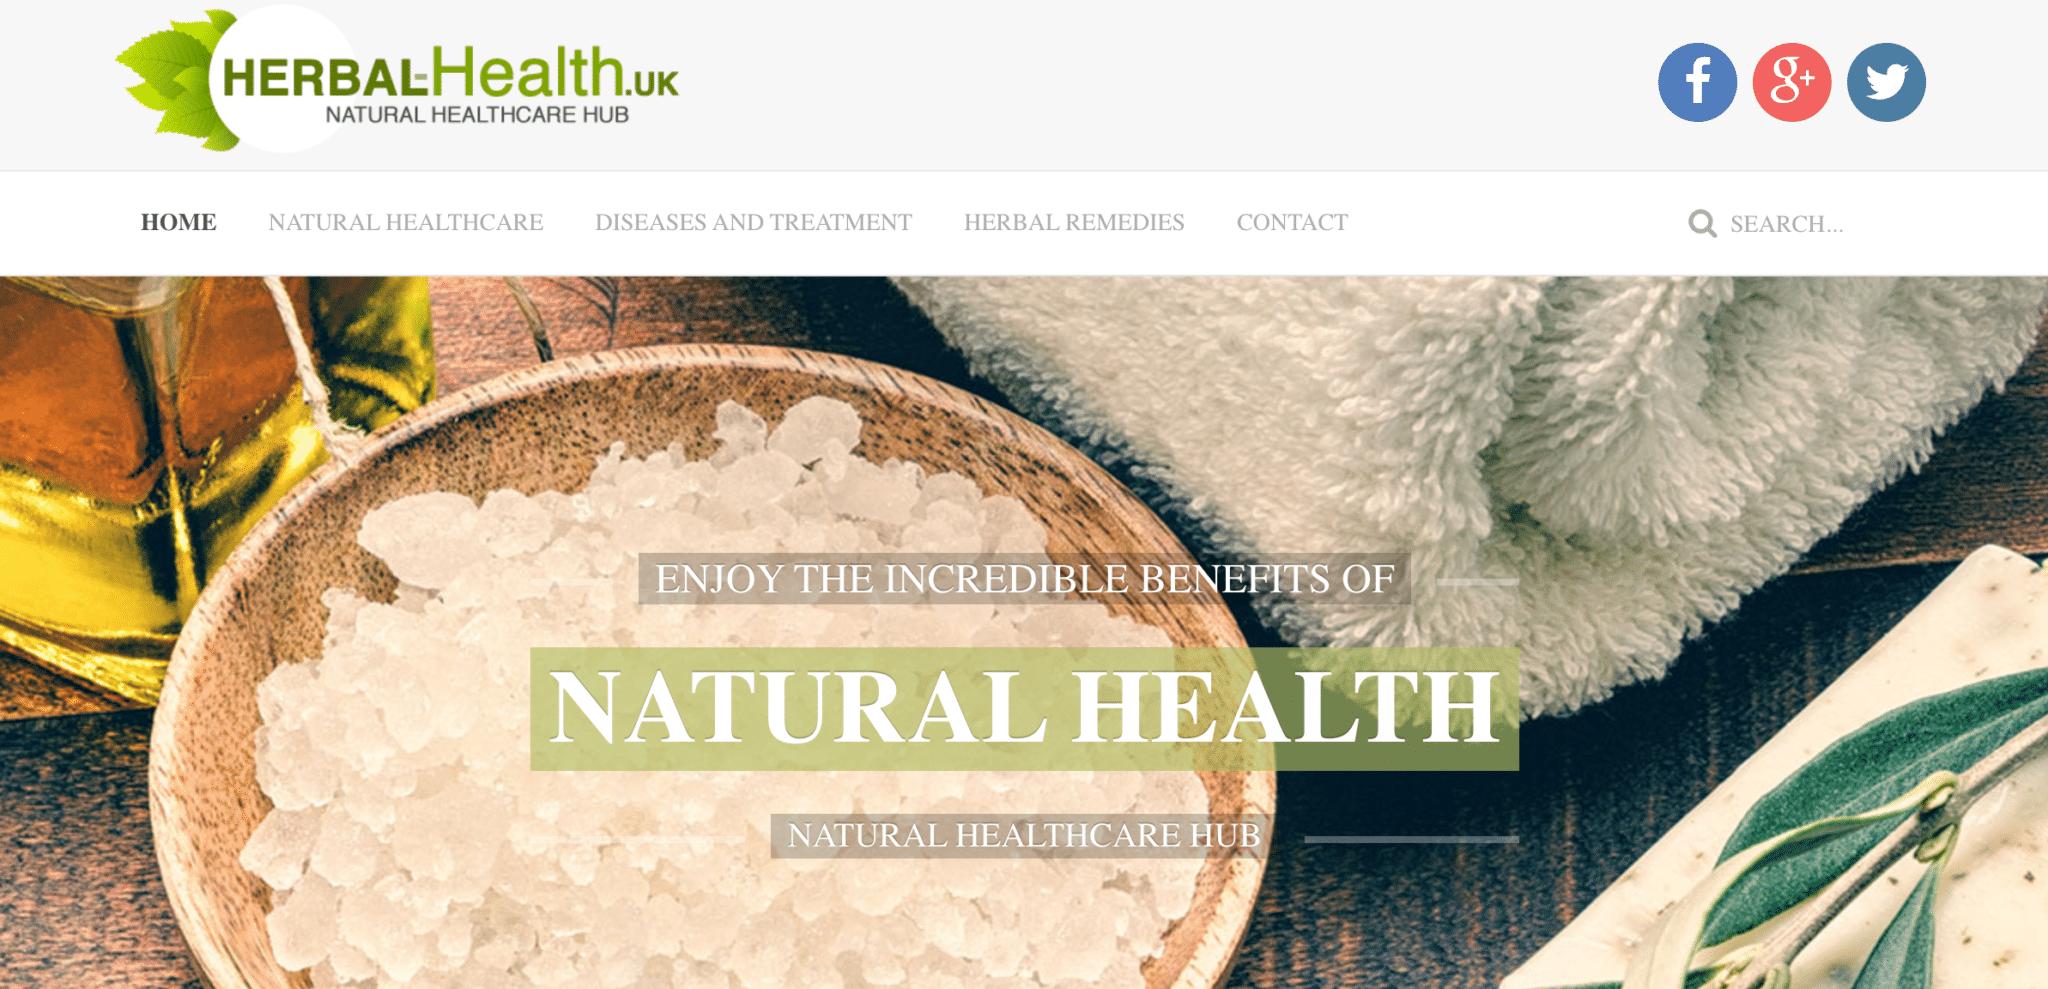 herbal health uk